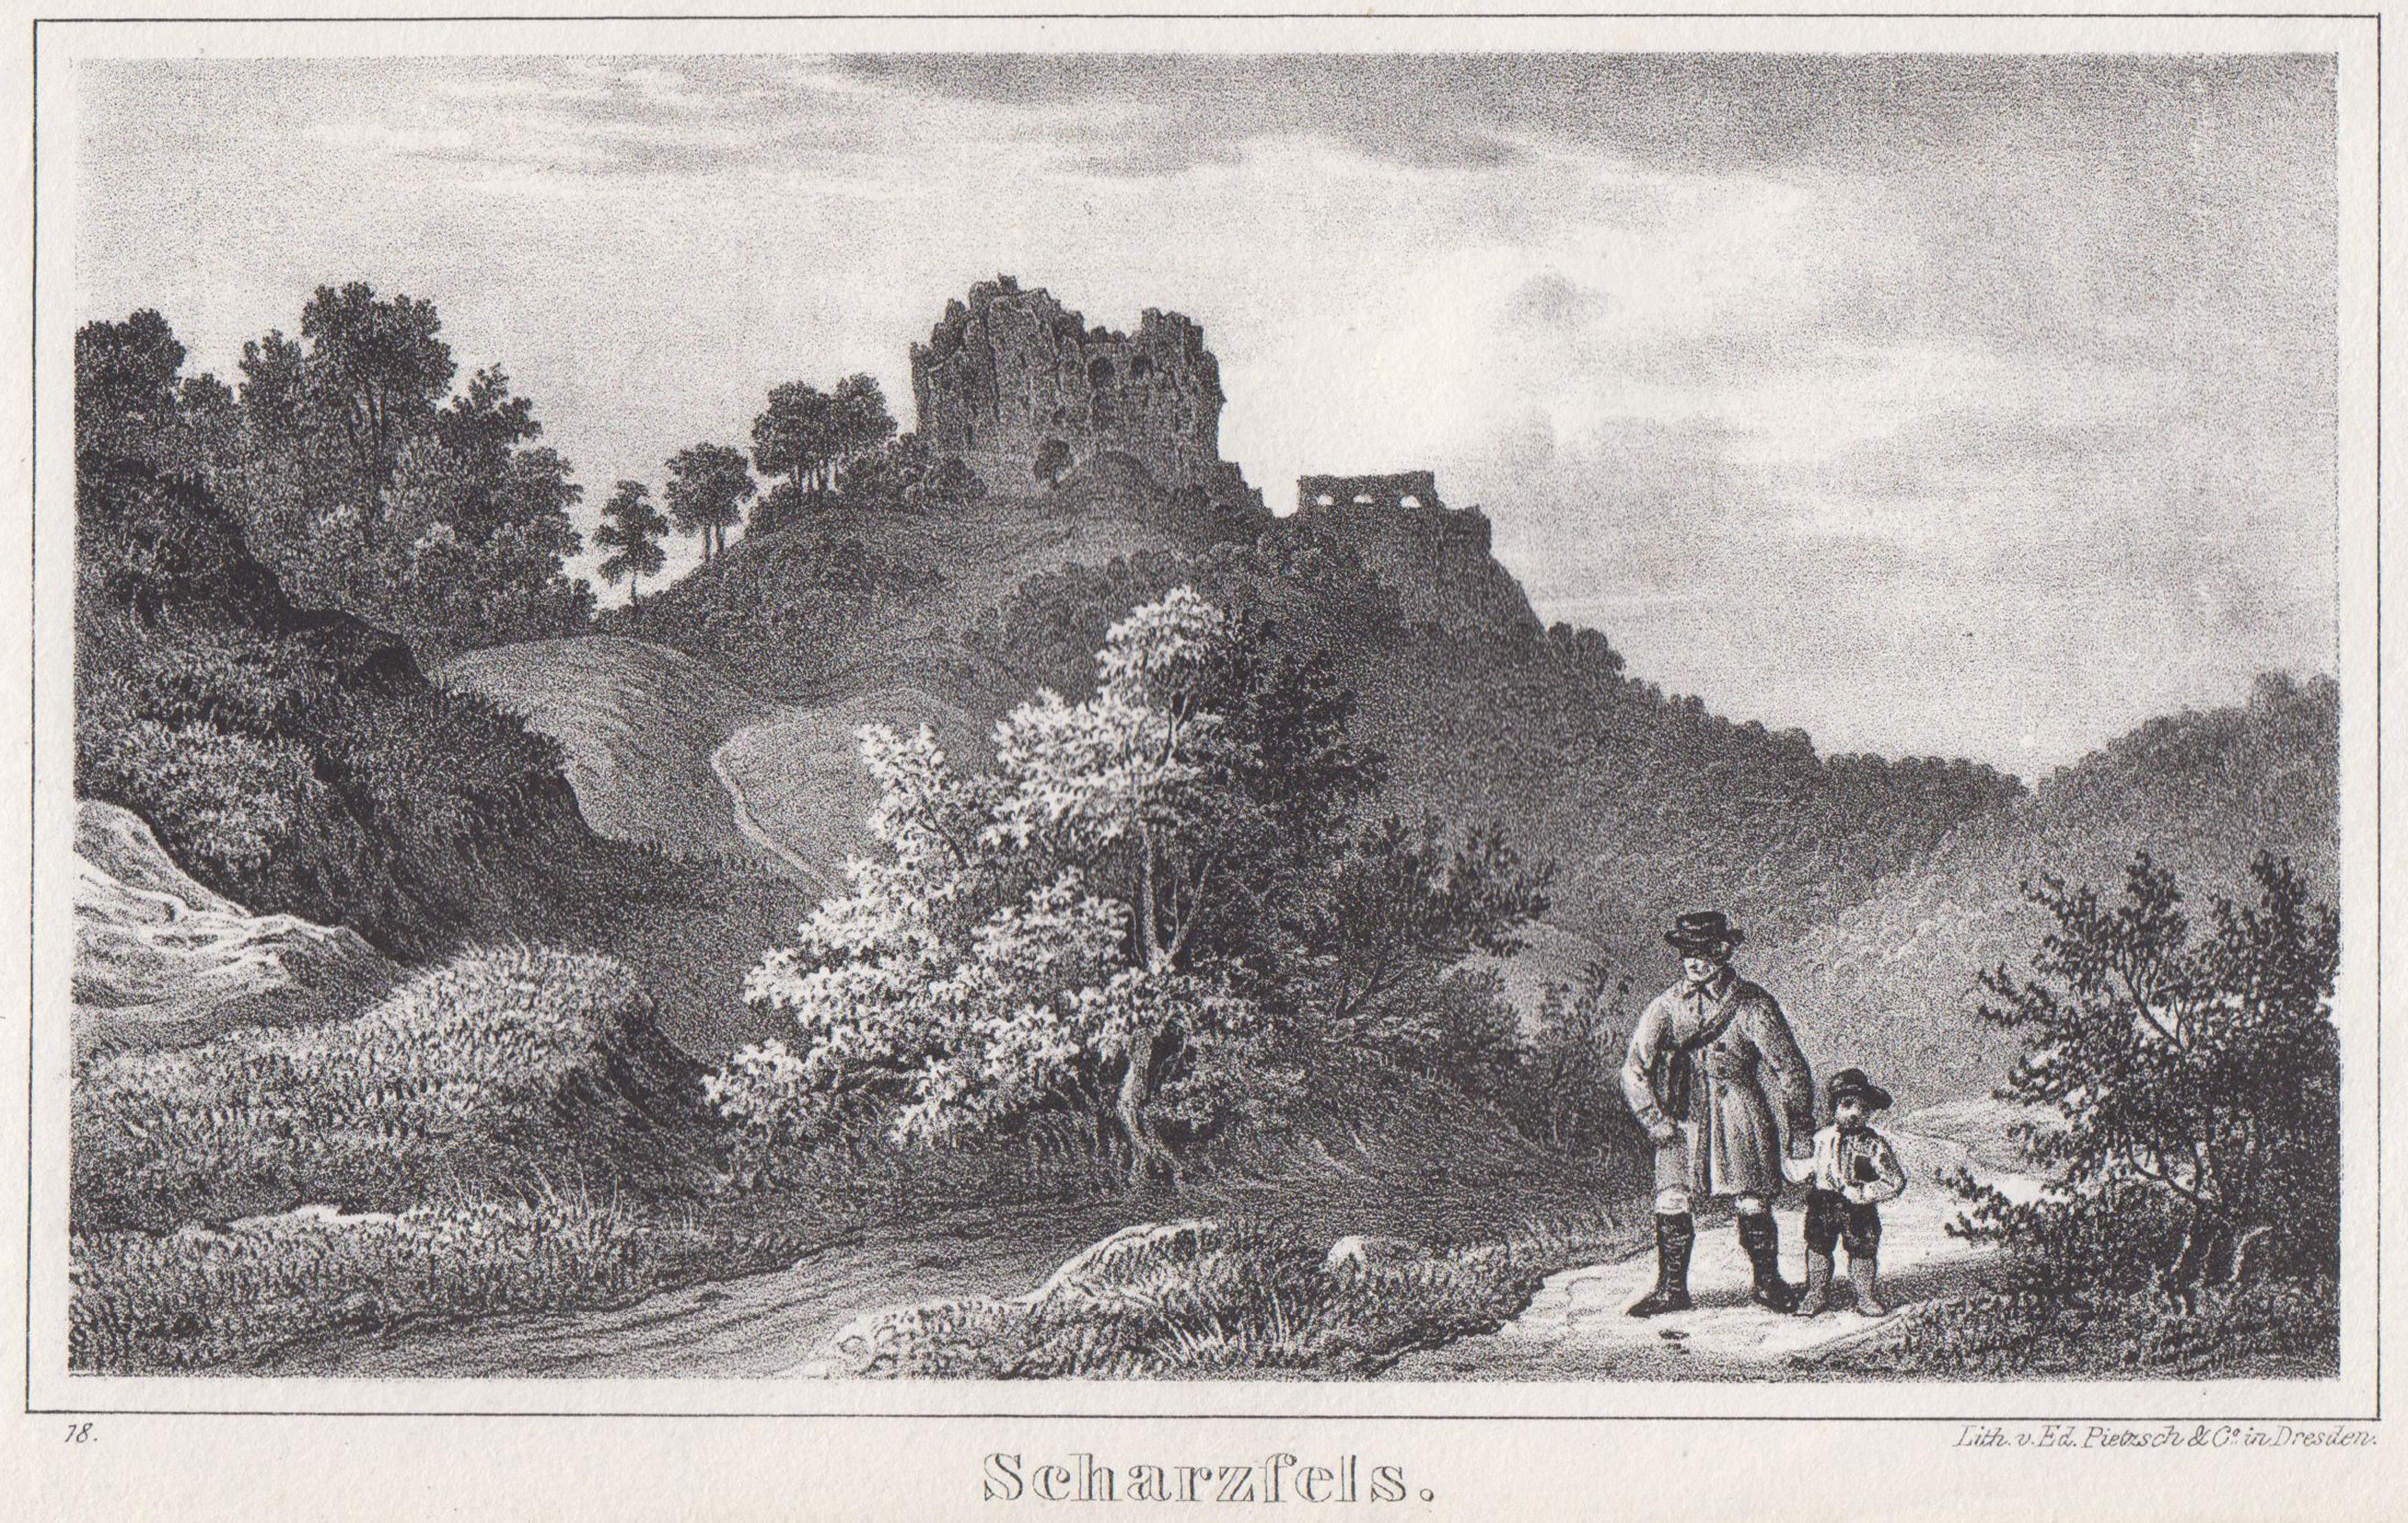 Ruine Scharzfels.: Herzberg Am Harz: